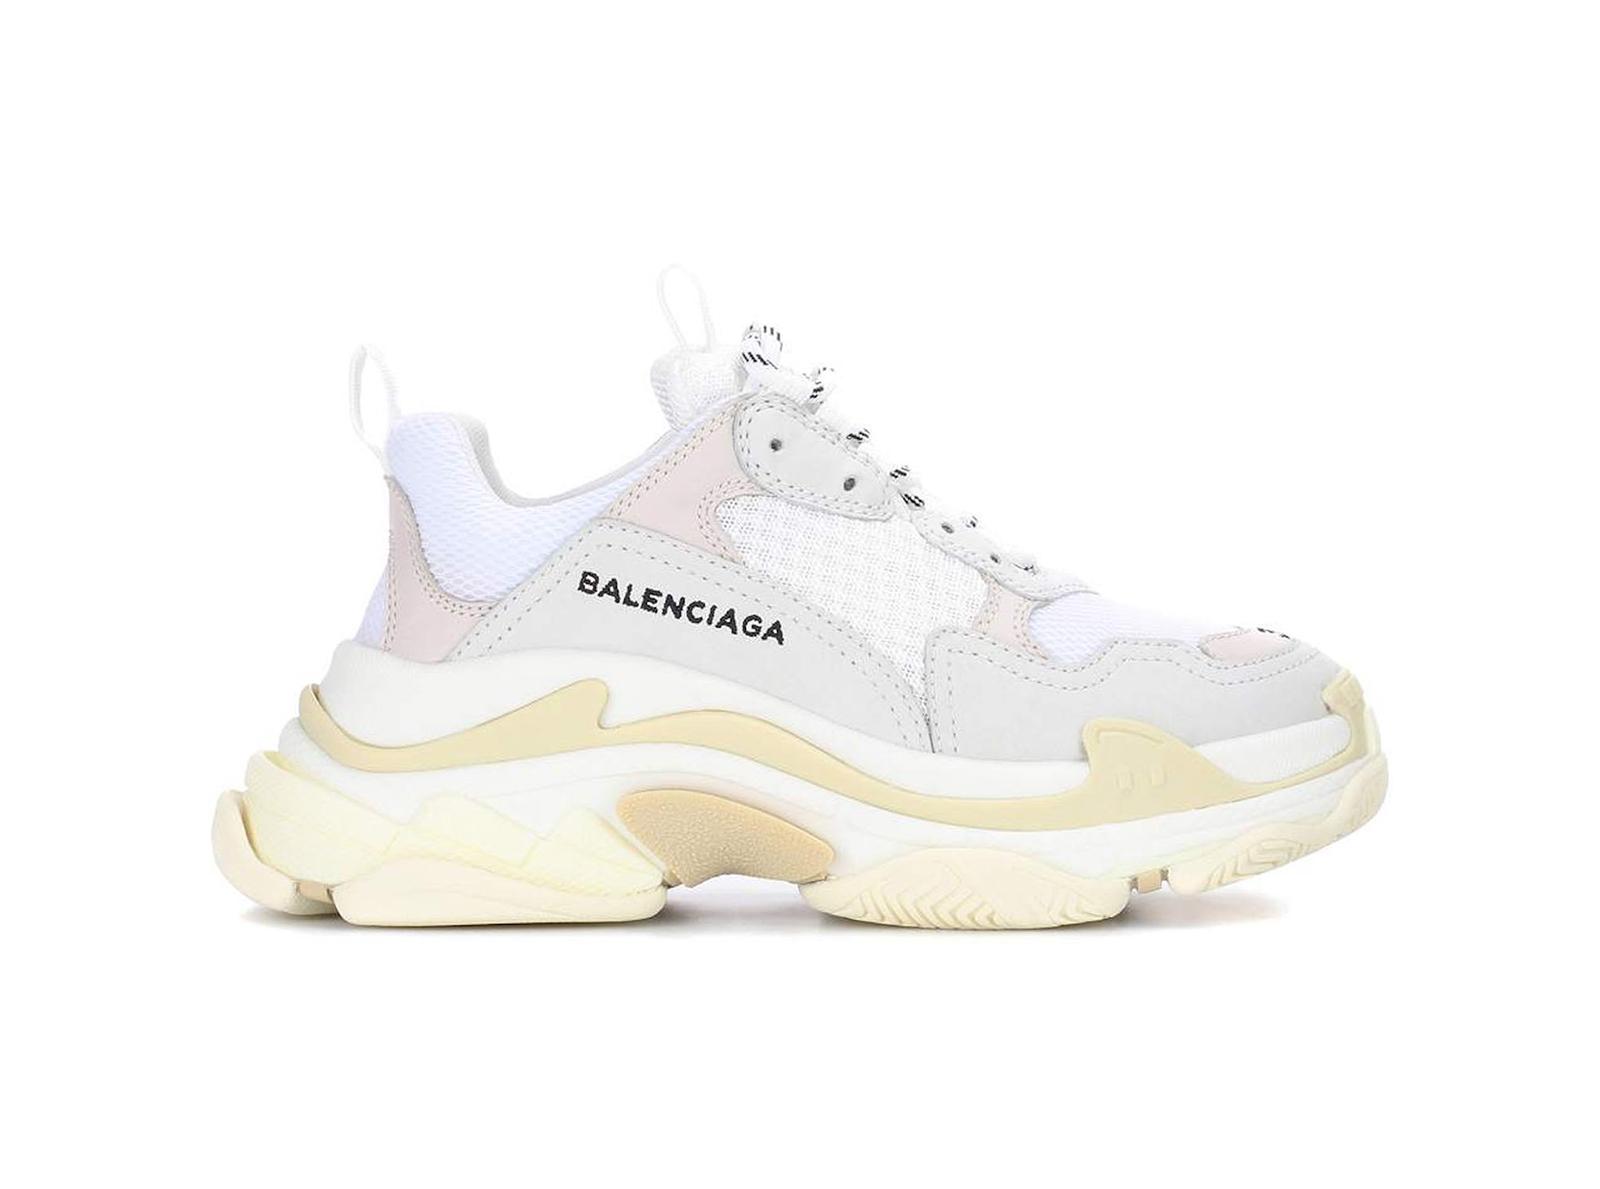 679013a0 BALENCIAGA - TRIPLE S SNEAKERS / WHITE - магазин Степшоп